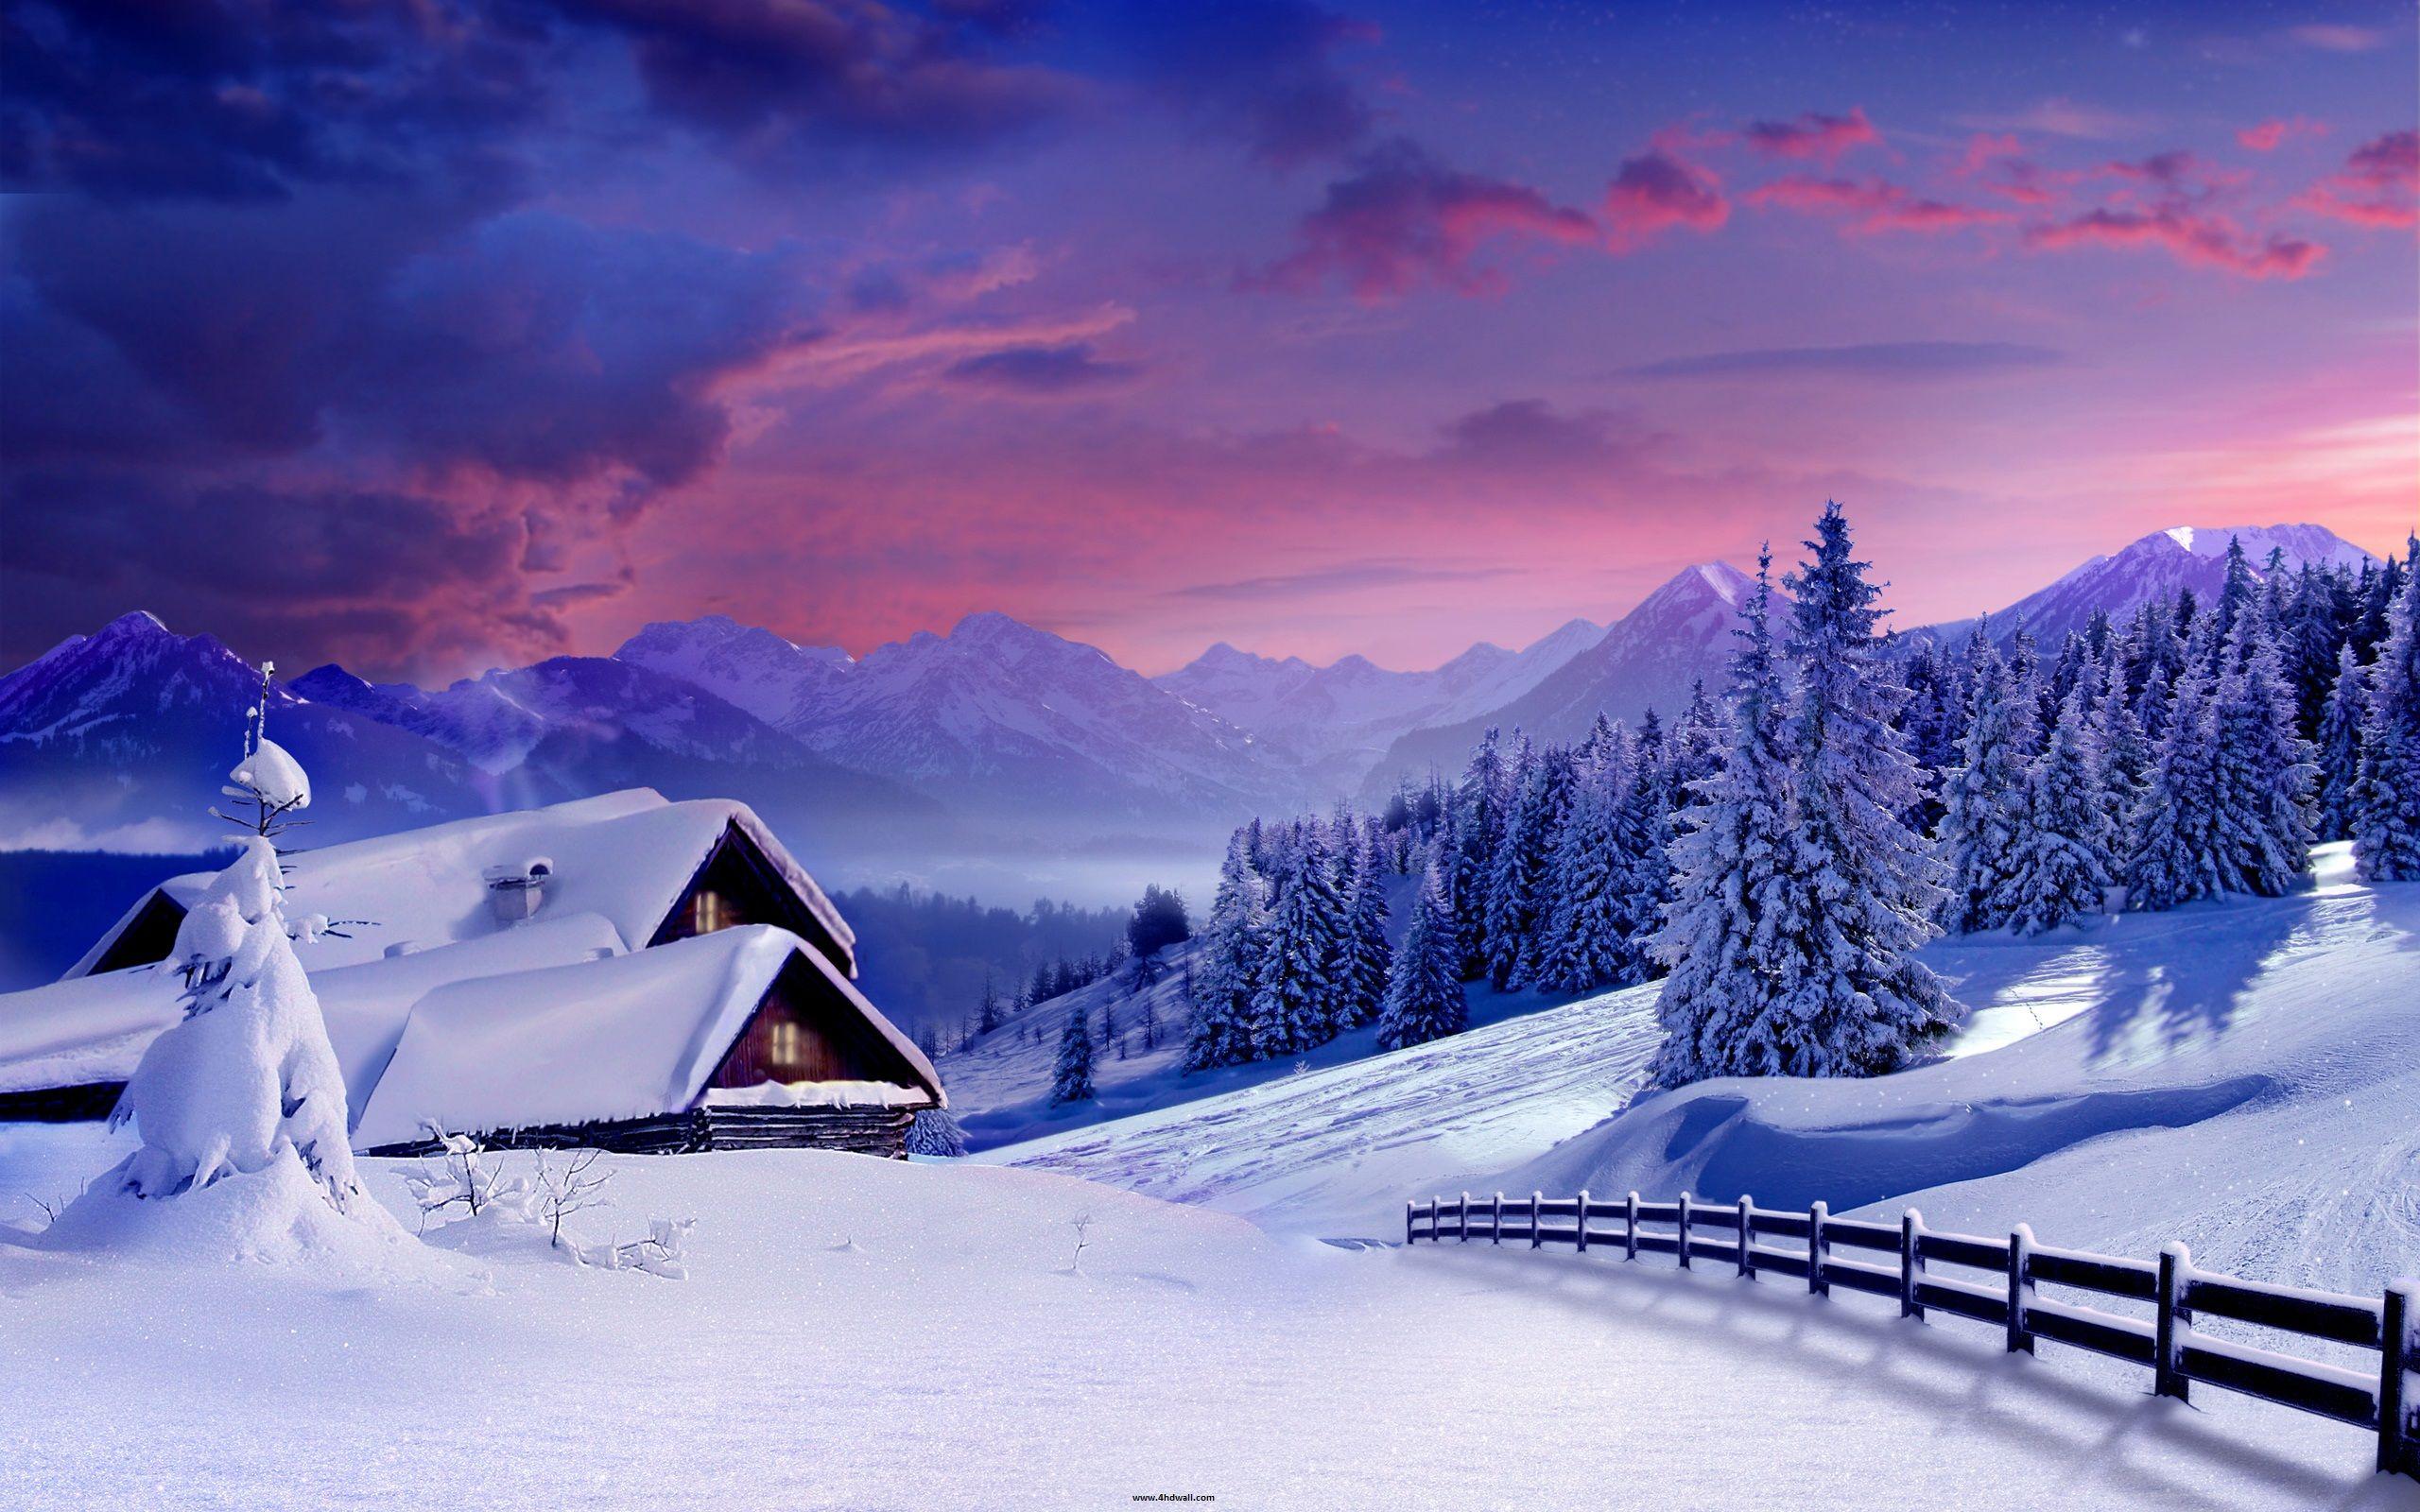 Hd Winter Wallpaper Wallpaper Winter Wallpaper Winter Landscape Winter Scenes